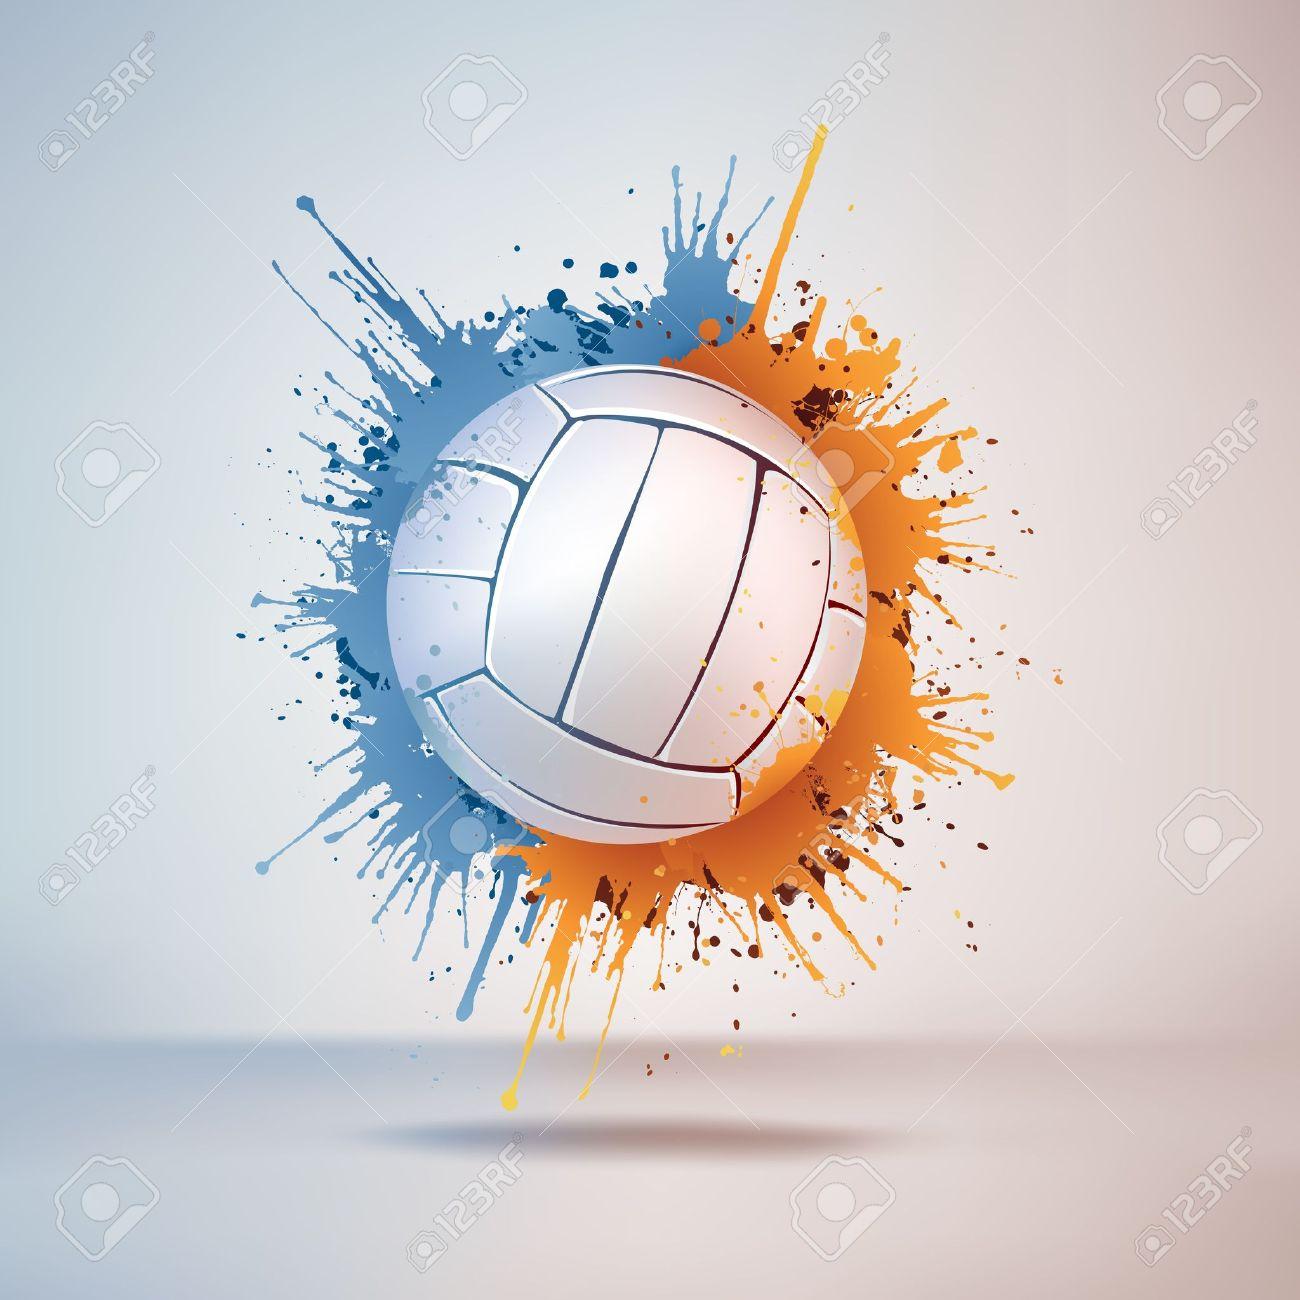 Volleyball Ball Stock Vector - 10351844